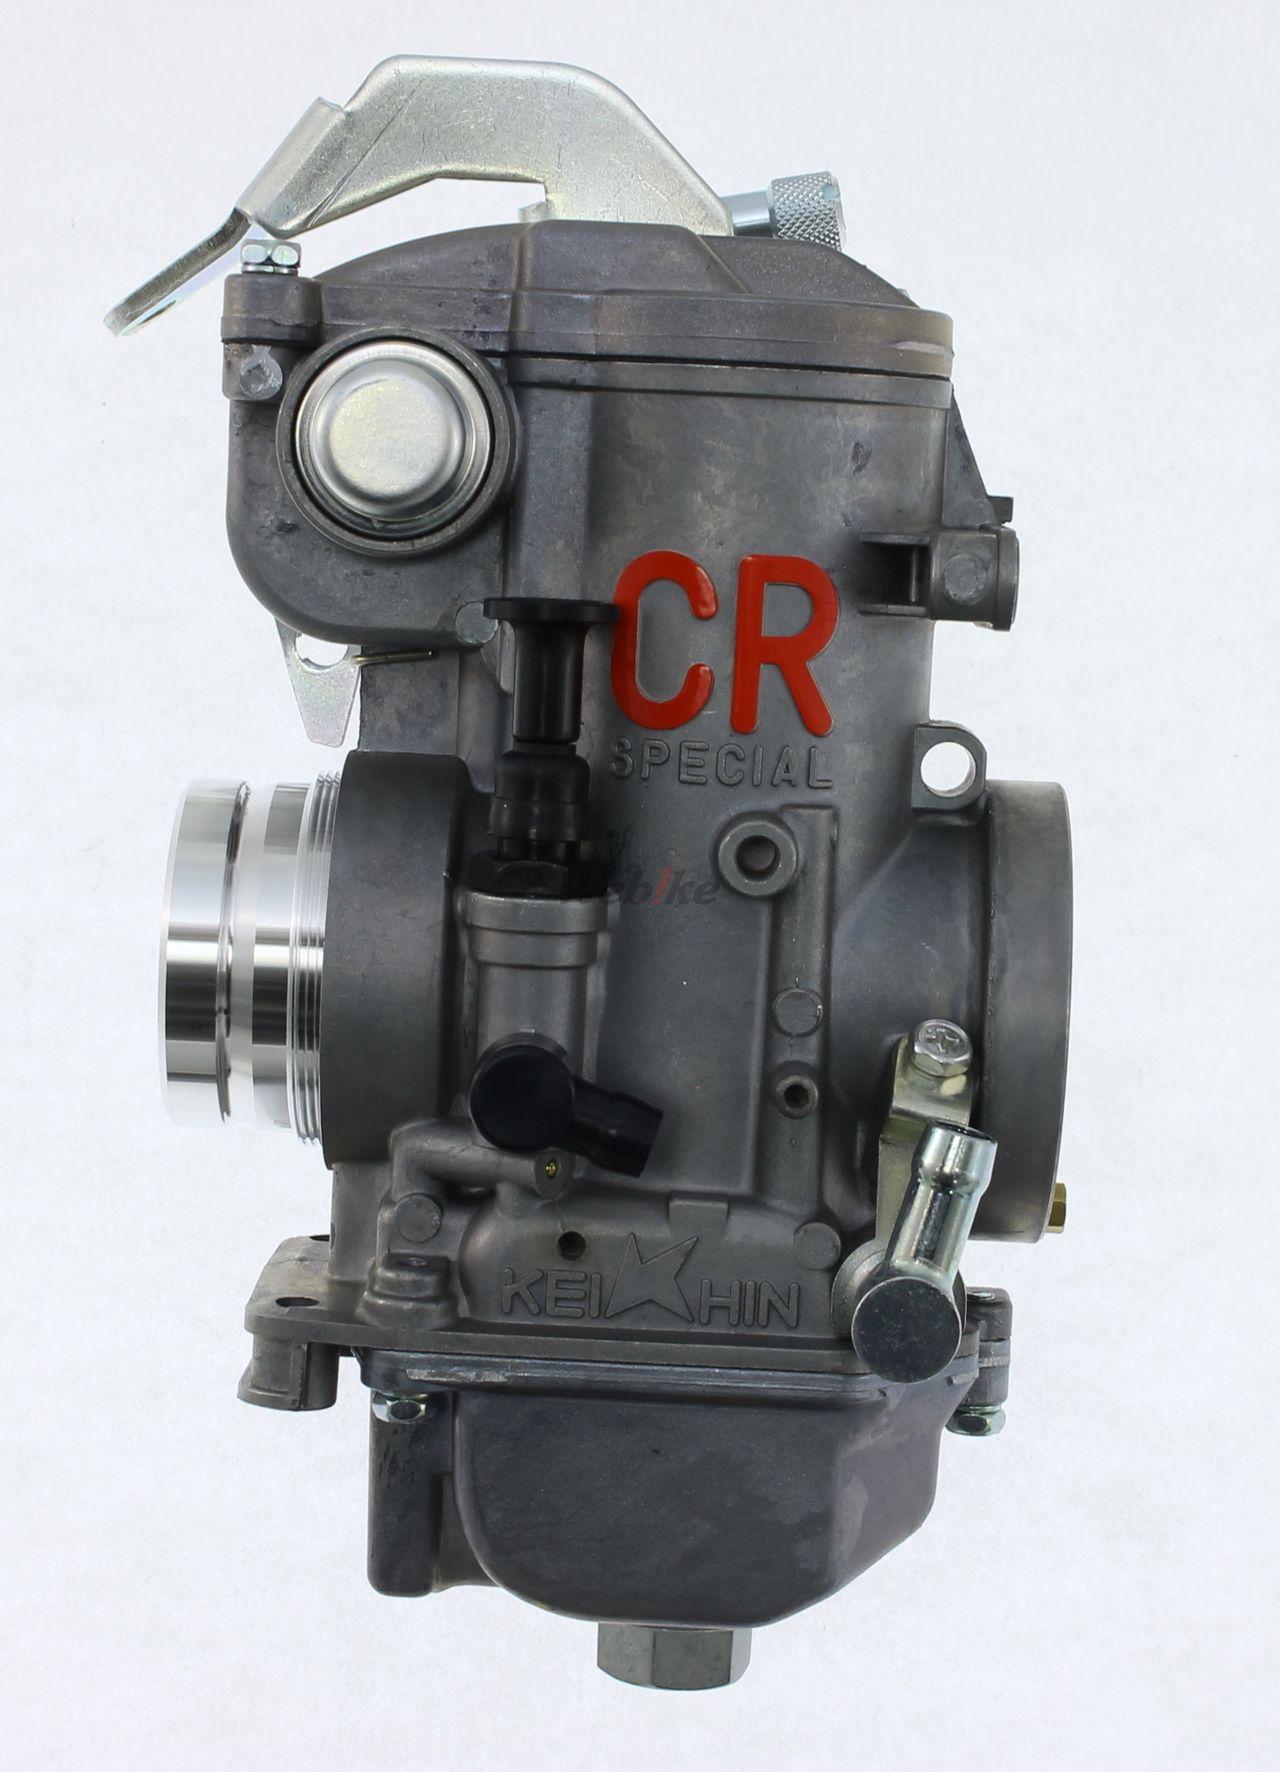 【WM】CR化油器 Φ38 CV化油器車用 - 「Webike-摩托百貨」